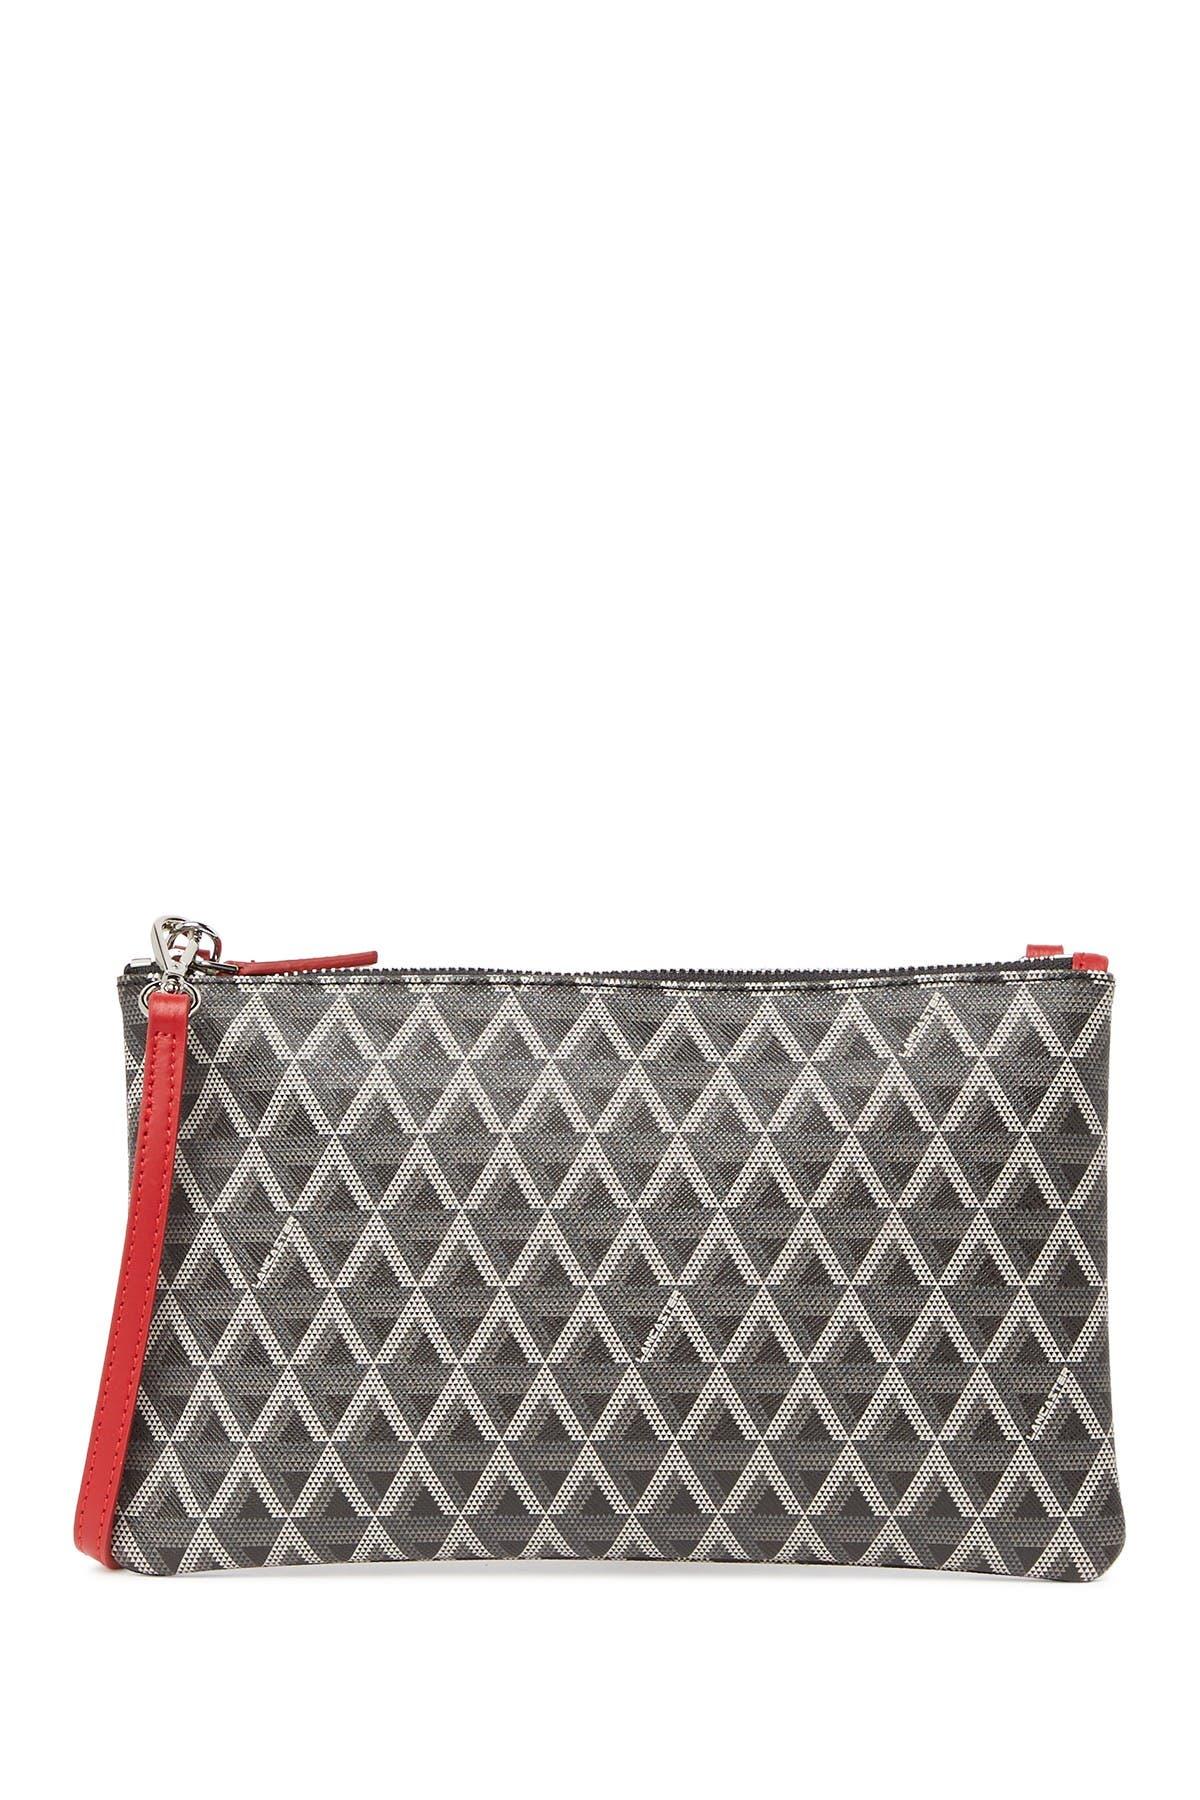 Image of Lancaster Paris Ikon Small Flat Crossbody Bag